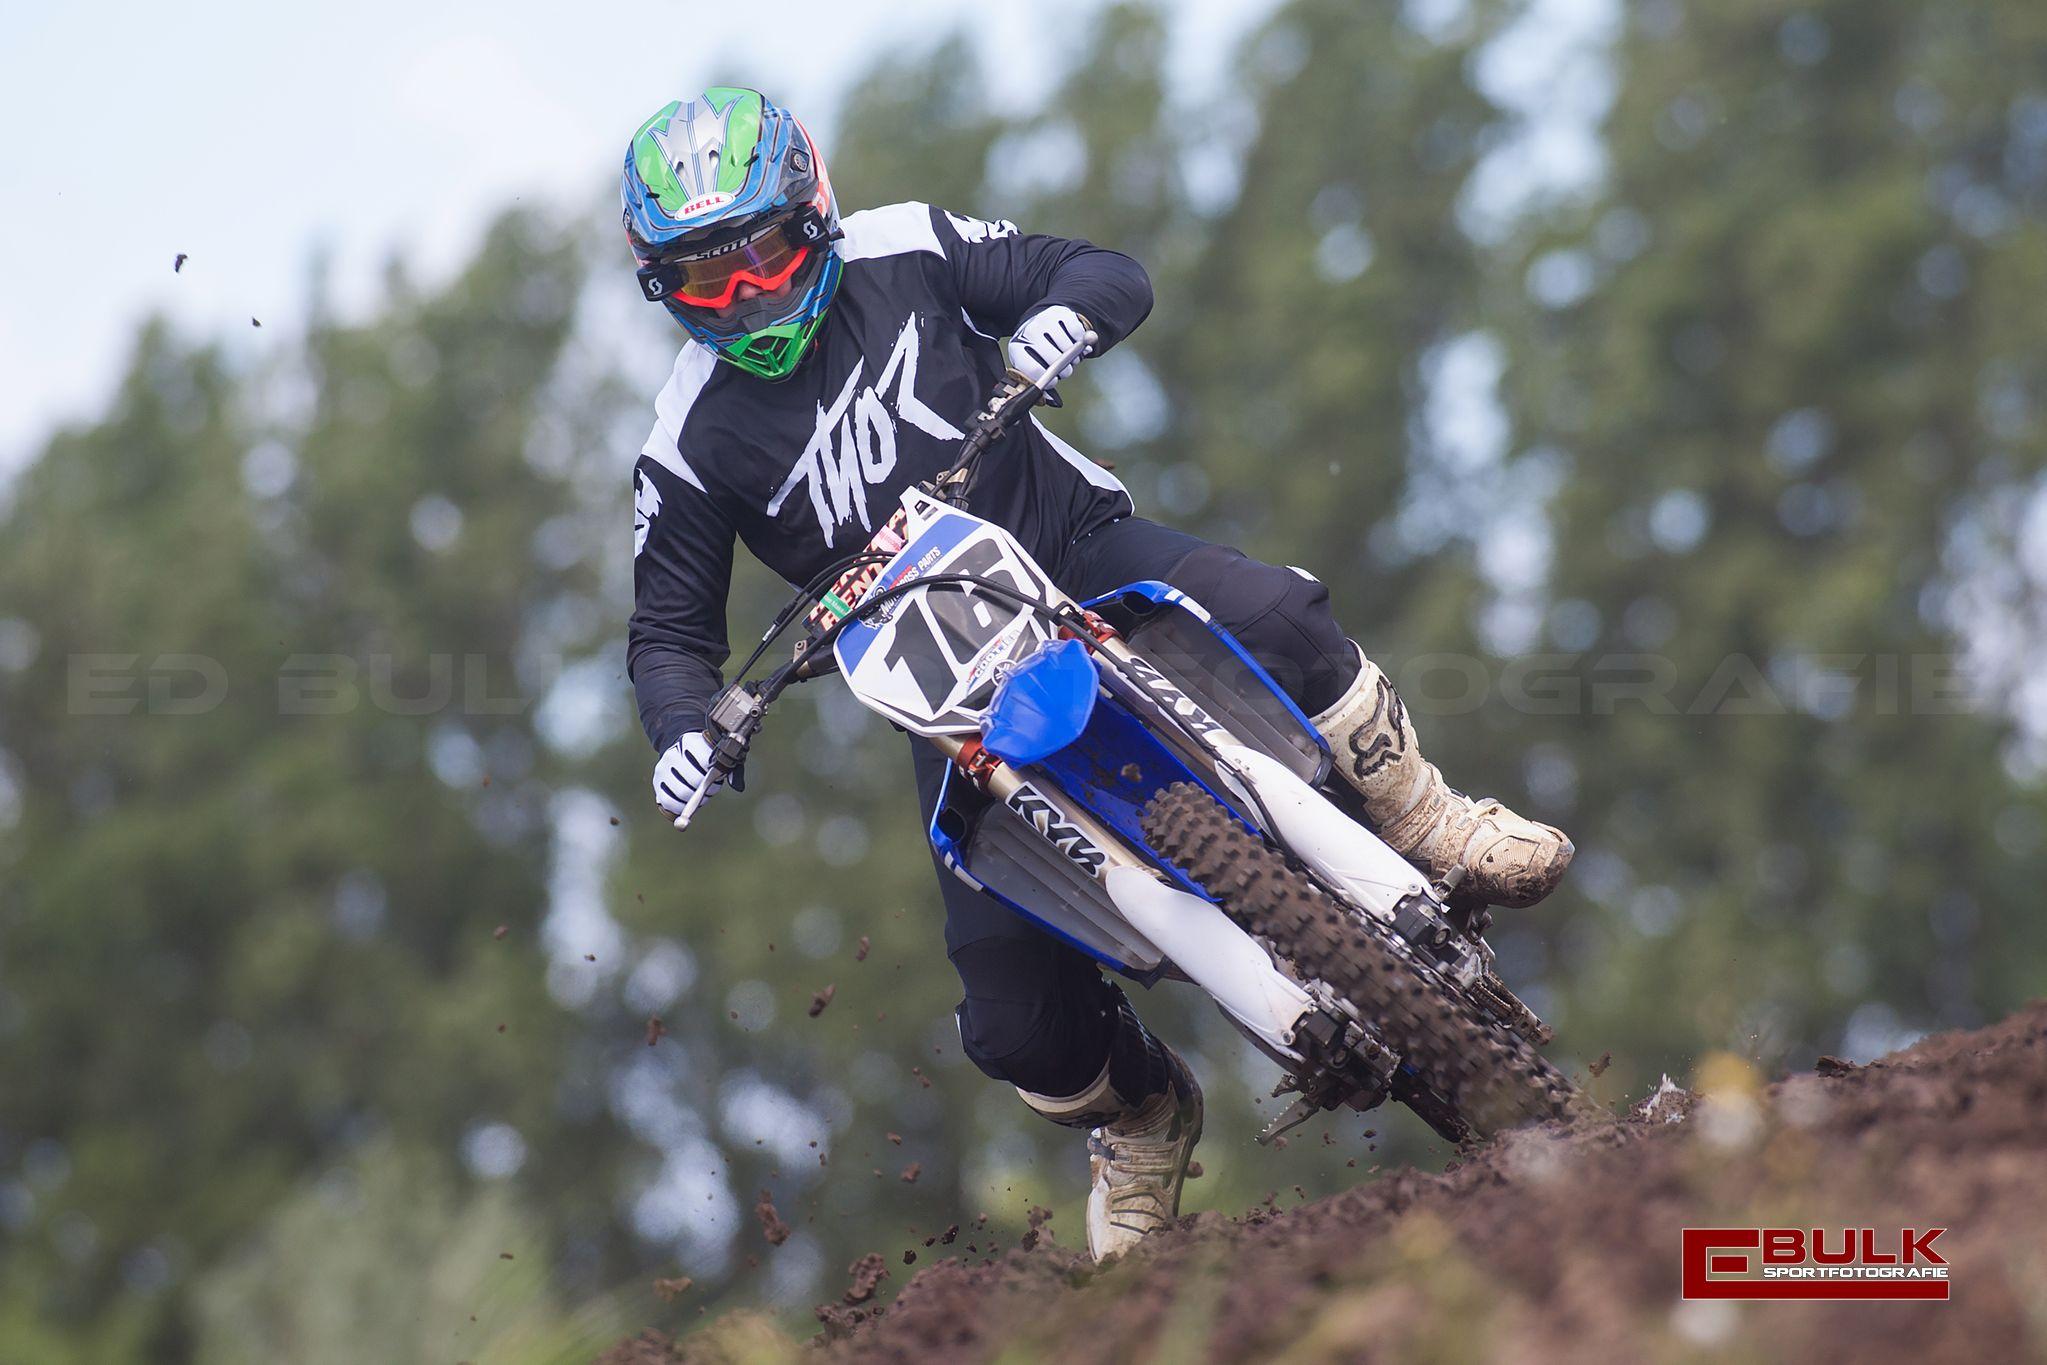 ebs_1757-ed_bulk_sportfotografie